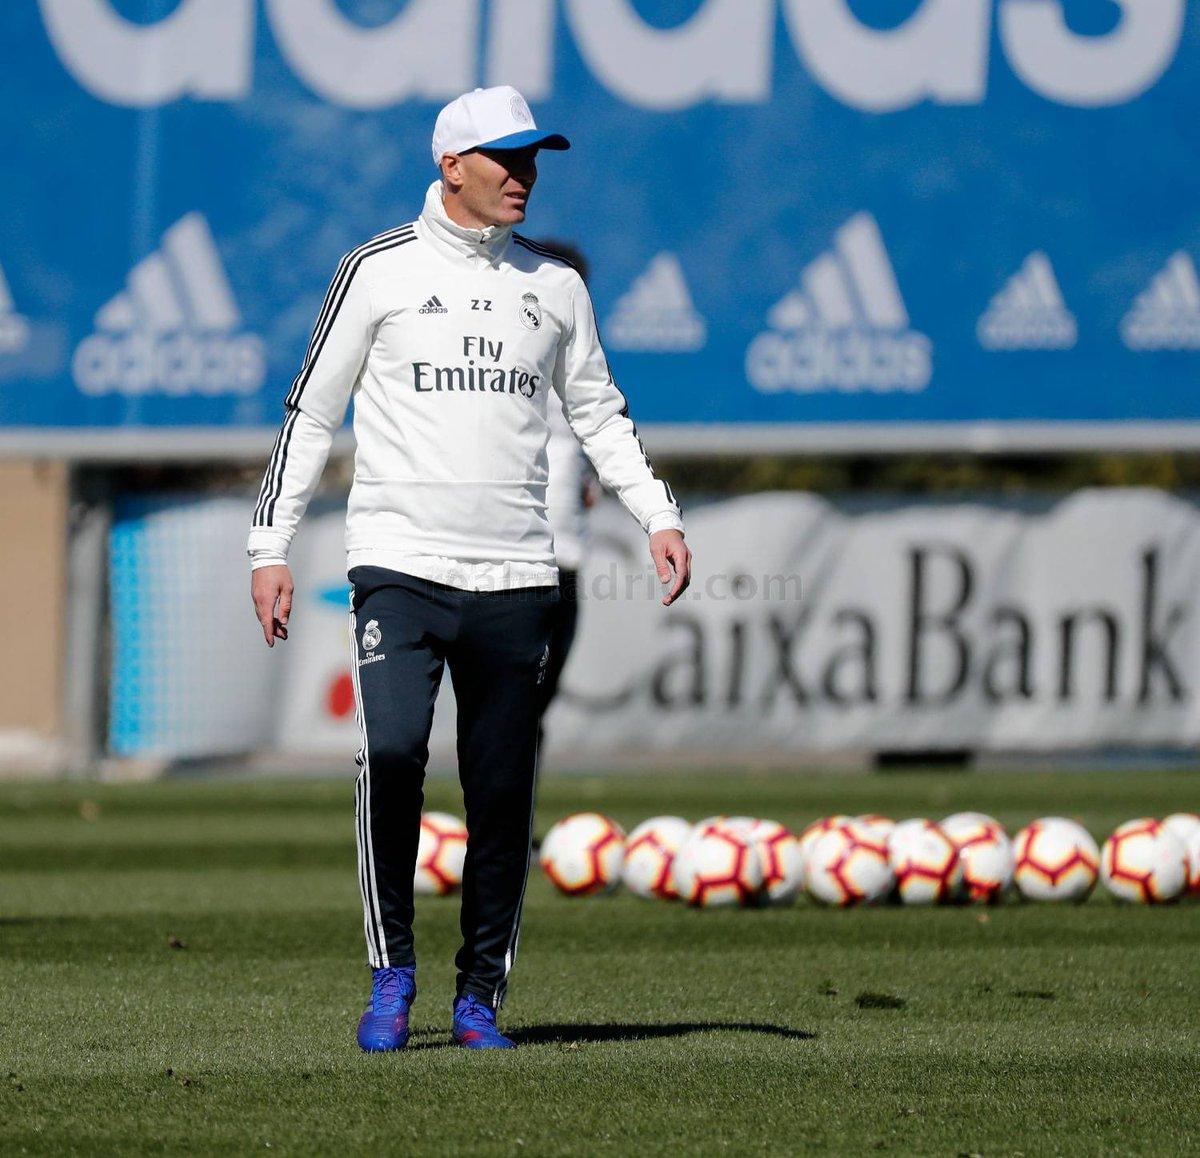 زيدان فى تدريبات ريال مدريد